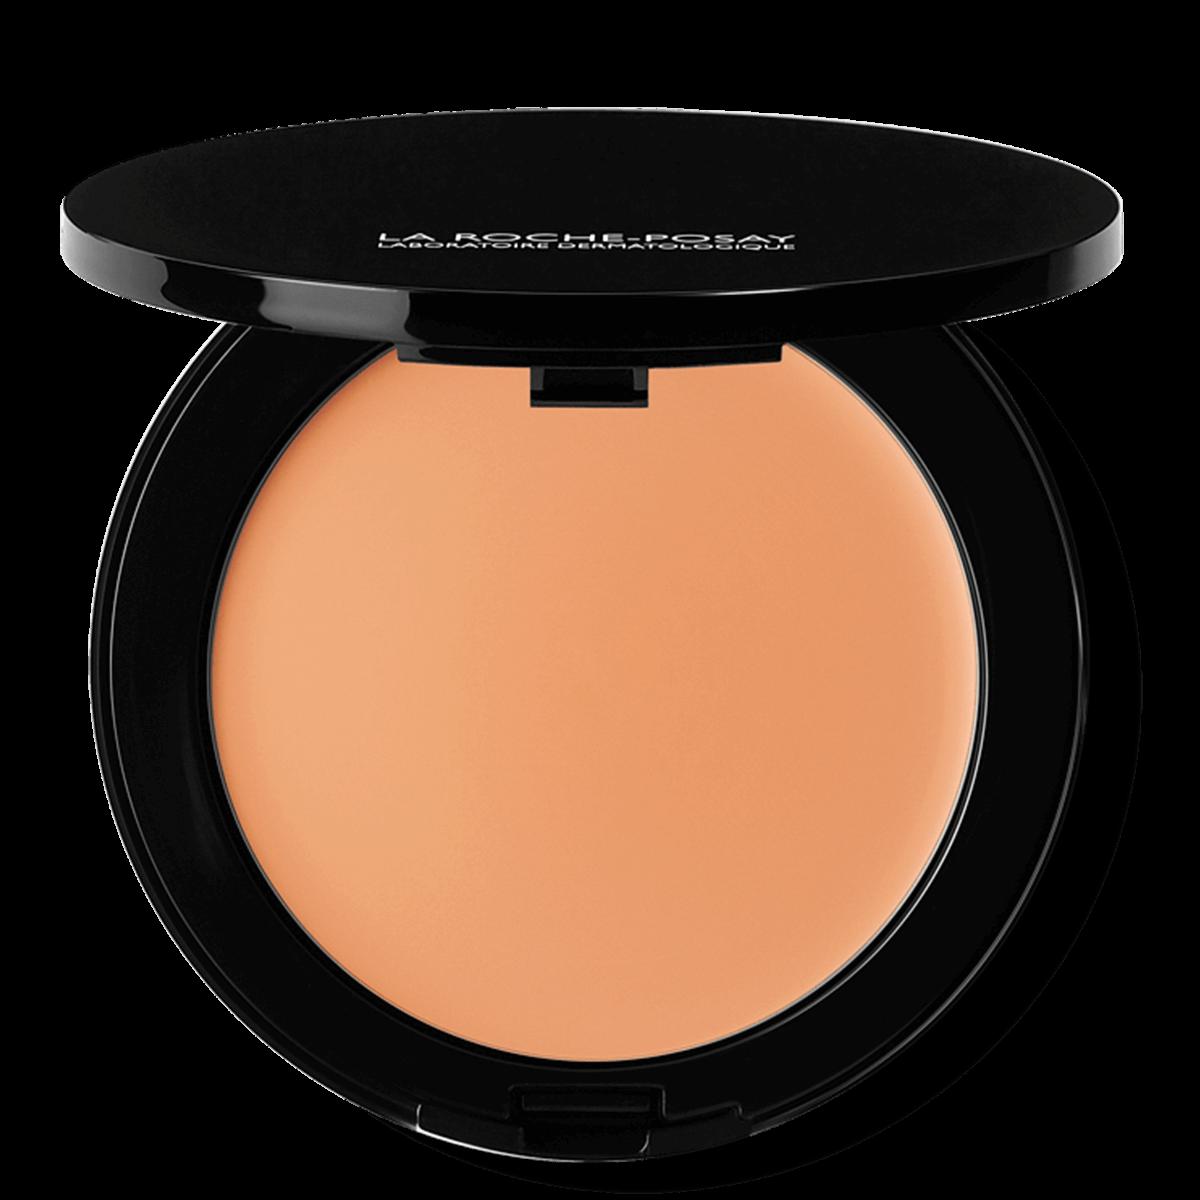 La Roche Posay Herkkä Toleriane Make up COMPACT CREAM 13SandBeige 3